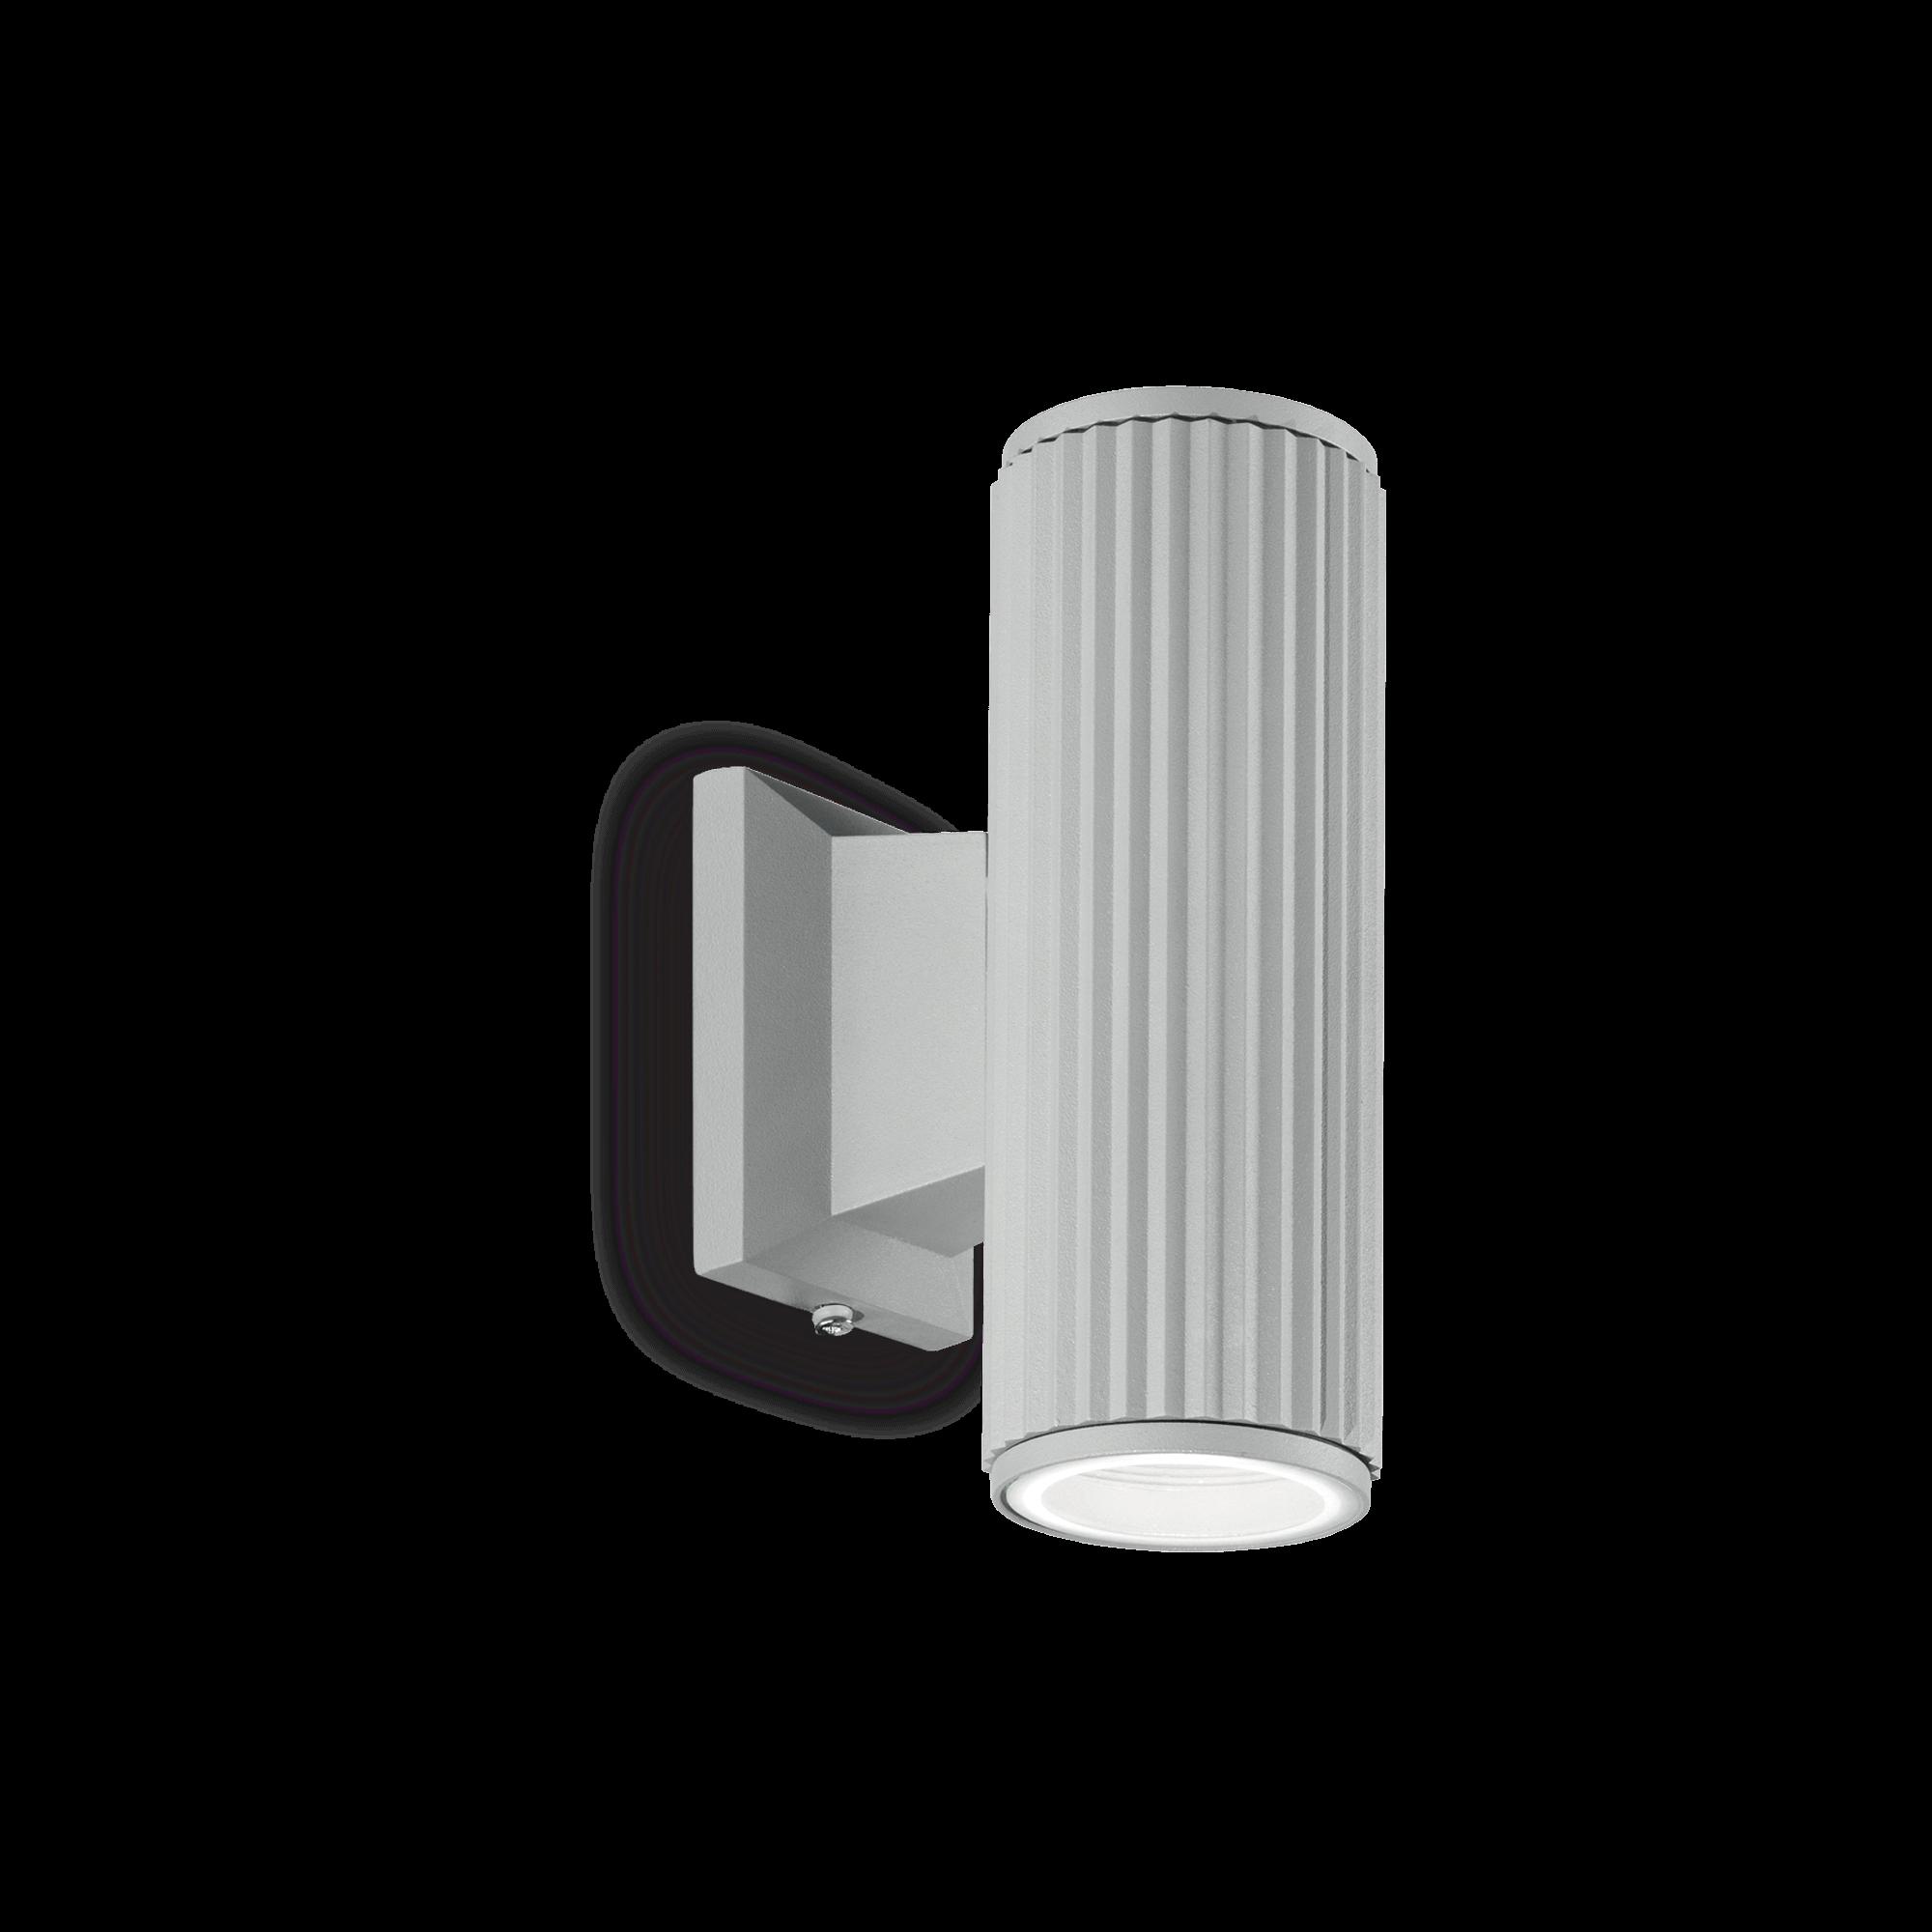 Ideal Lux 129440 BASE AP2 GRIGIO kültéri fali lámpa